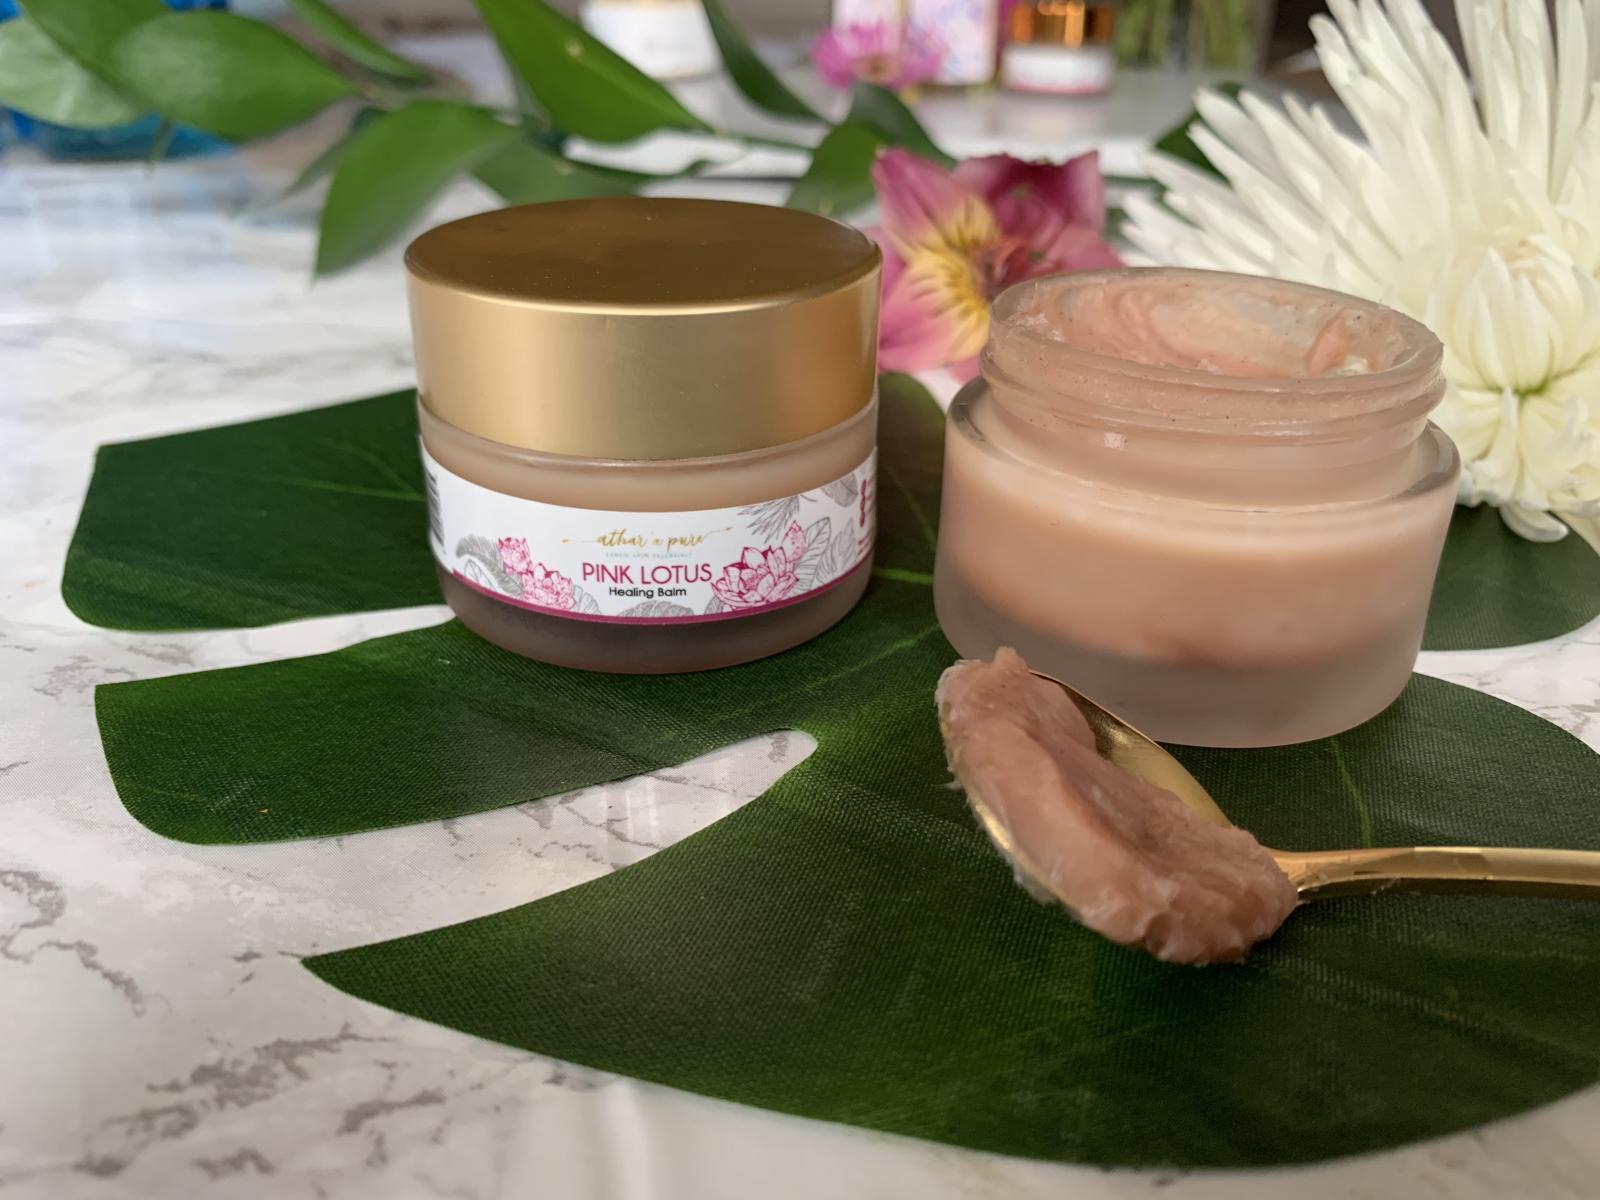 Pink Lotus Hydrating Facial Balm